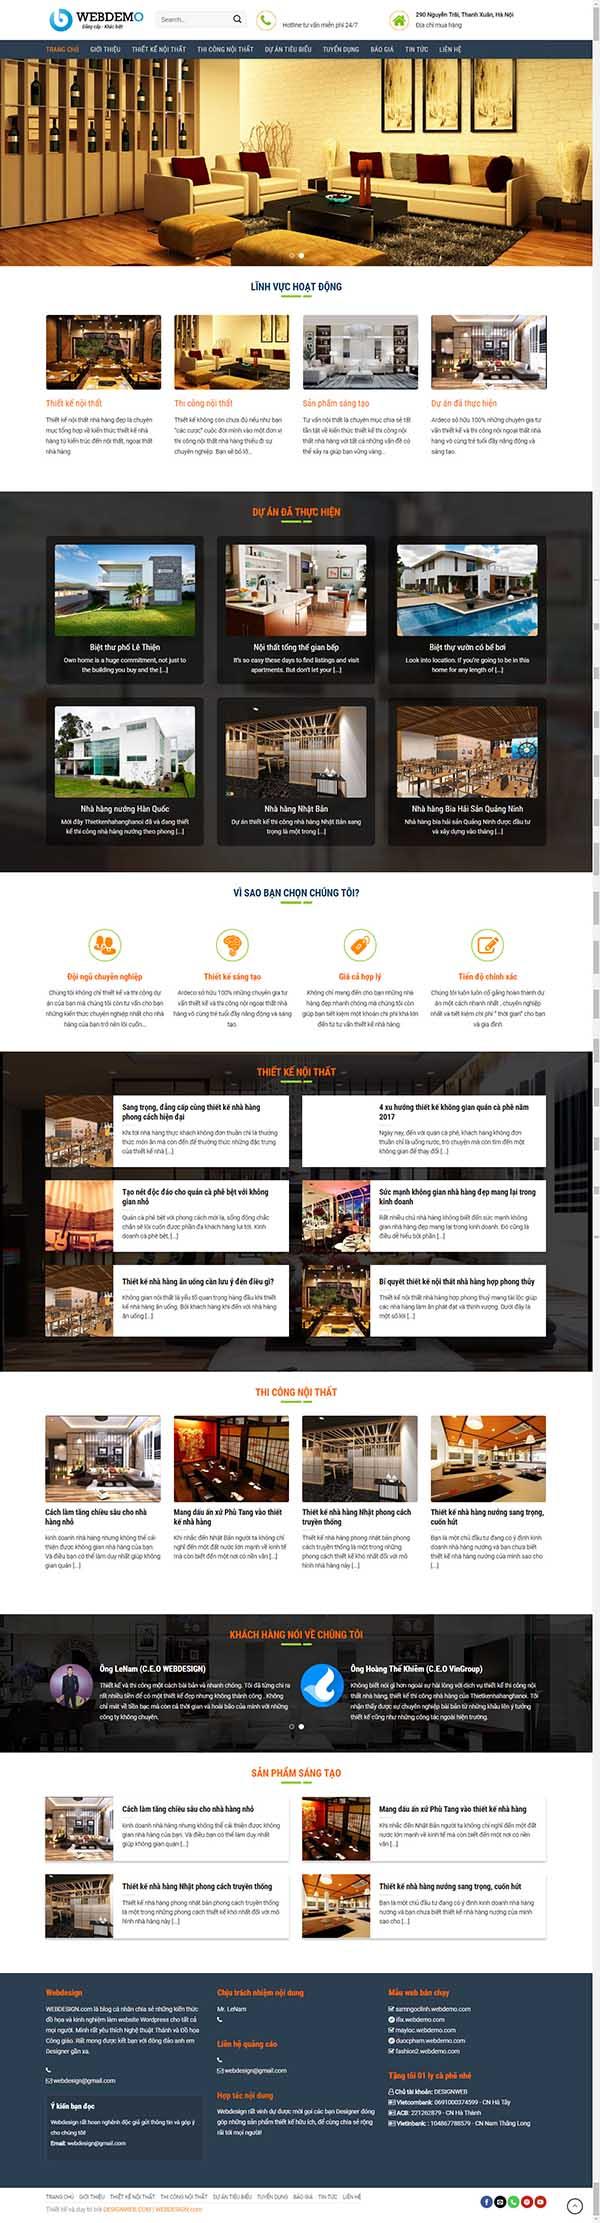 Thiết kế Mẫu website kiến trúc nội thất KTNT17